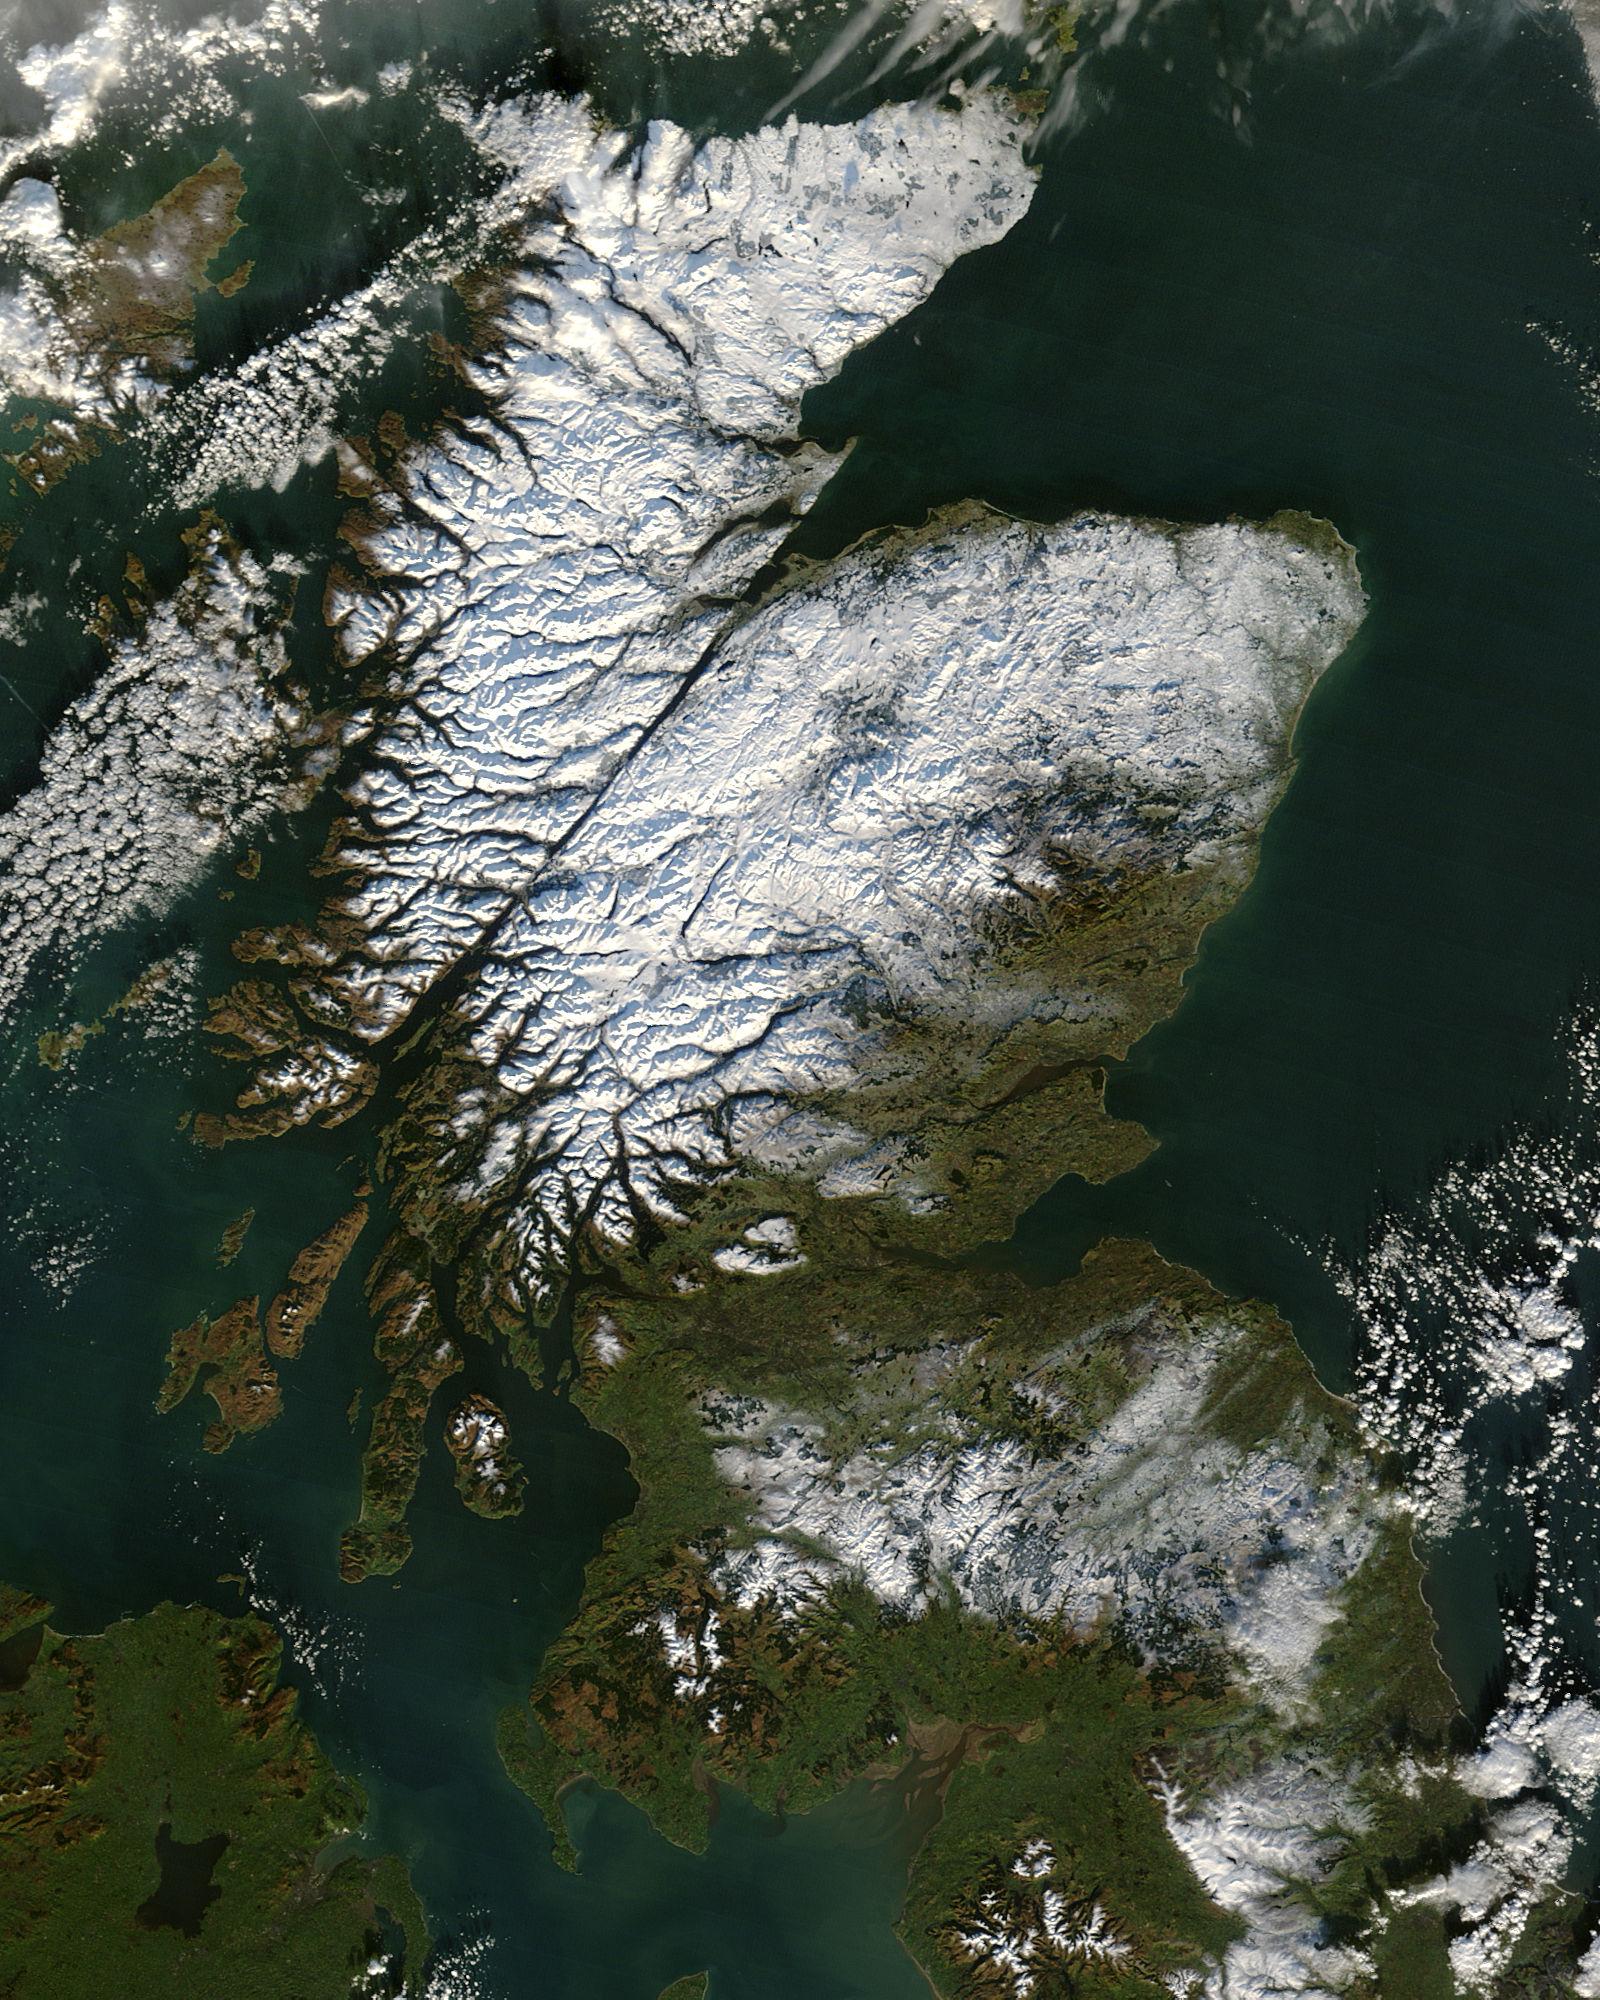 FileScotland From Satellitejpg Wikimedia Commons - Photos from satellite